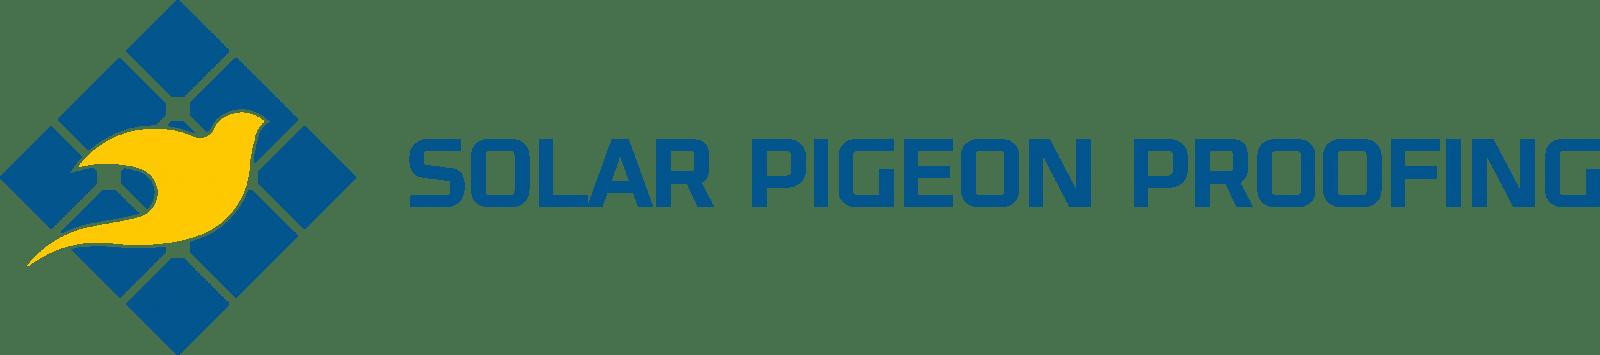 Solar Pigeon Proofing